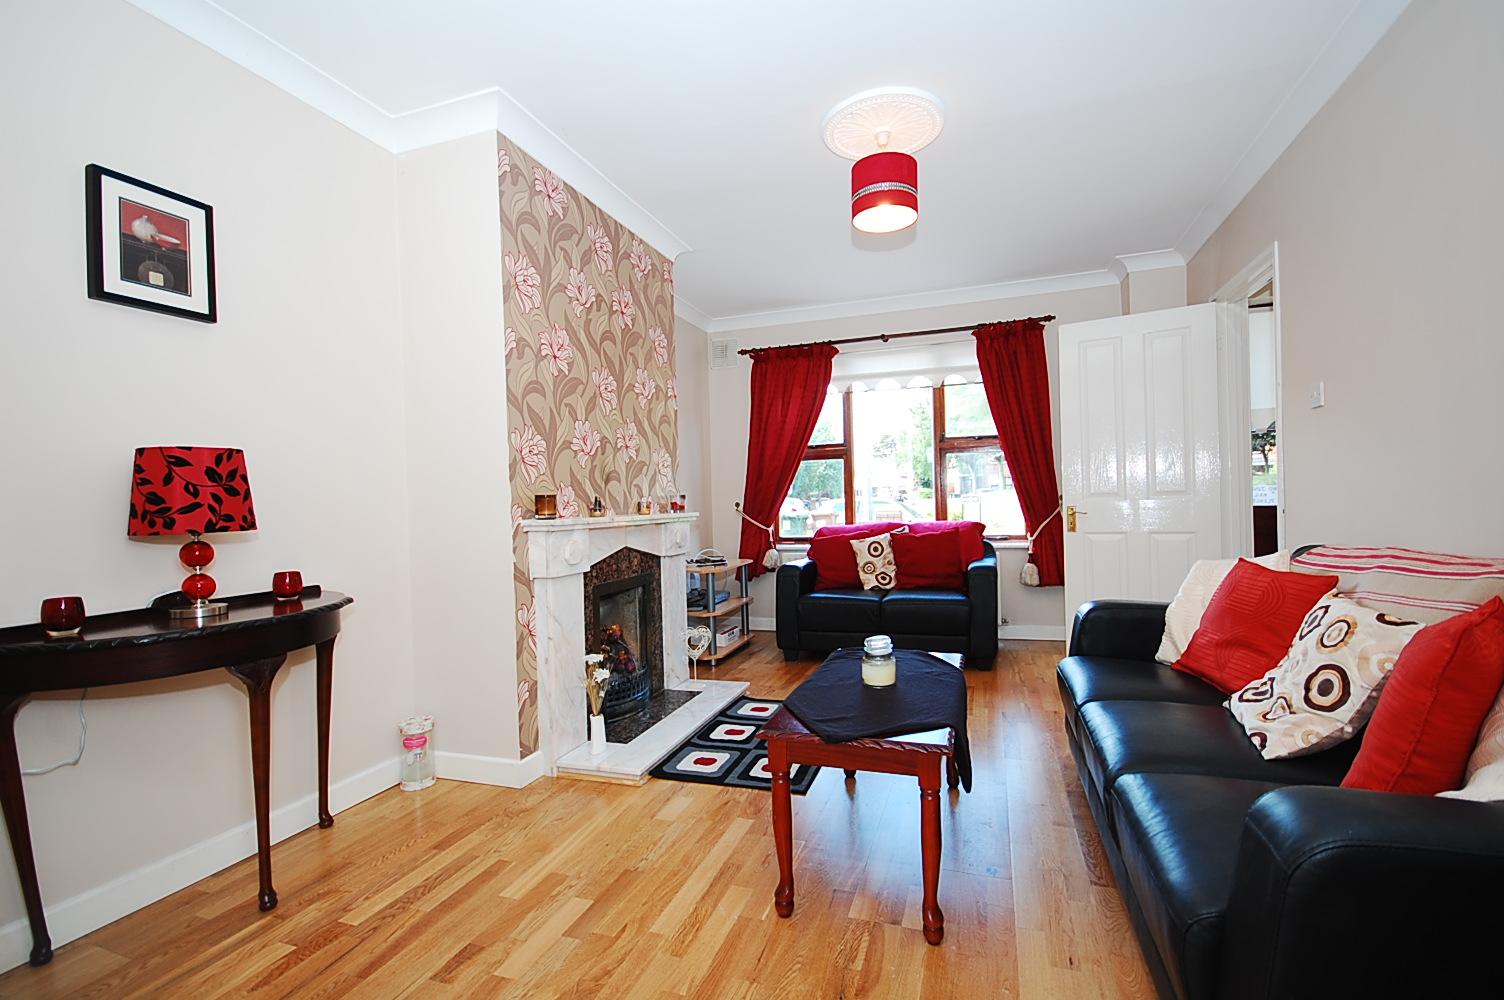 346 Collinswood, Whitehall, Dublin 9